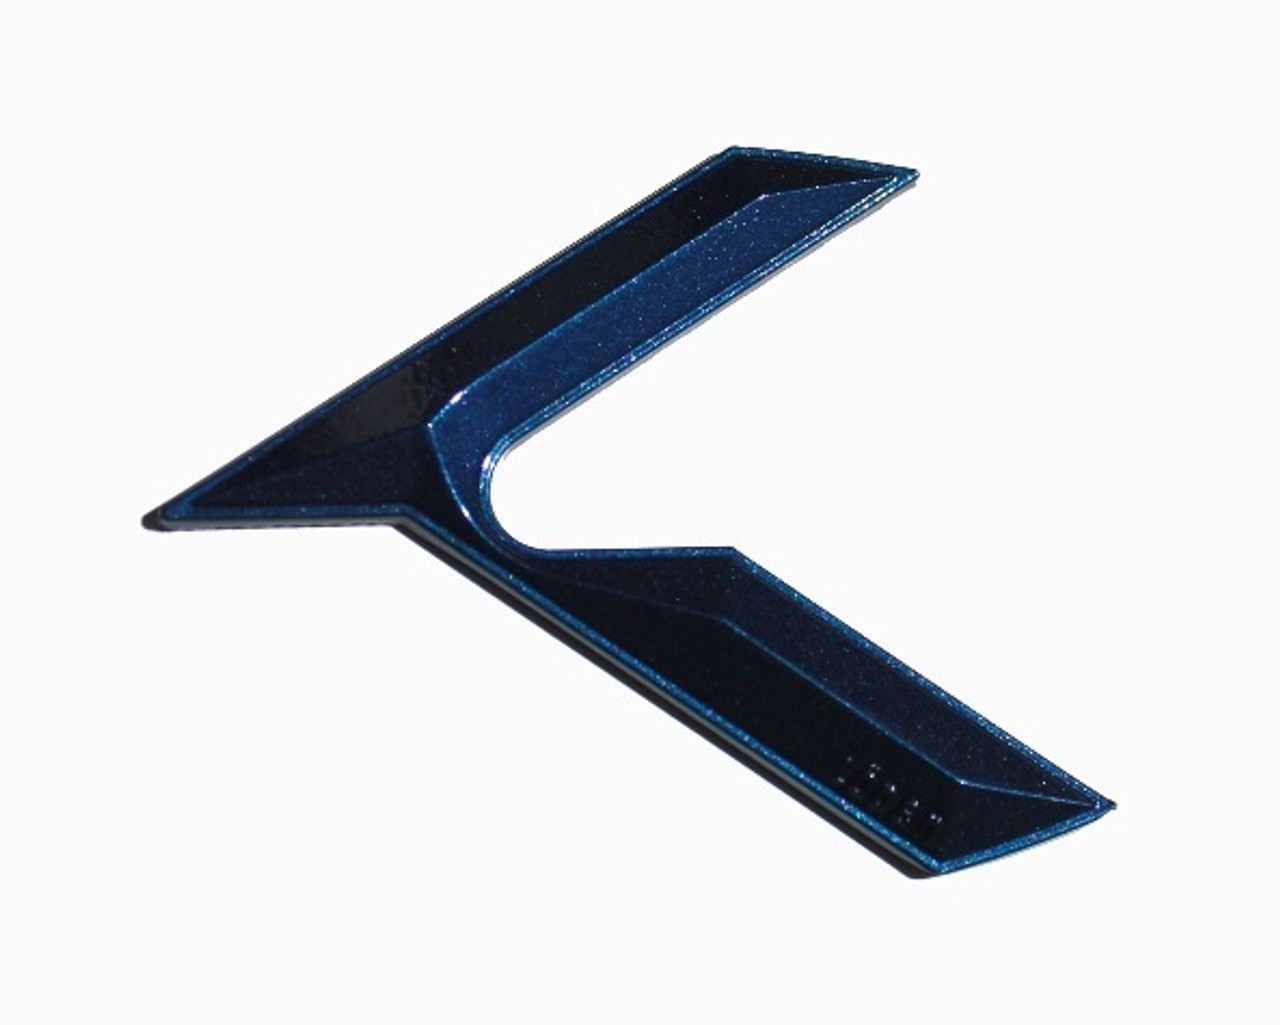 K Accent emblem badge logo for Kia Hyundai Lexus style K logo for fender trunk hood engine bay interior console and more Optima K emblem K900 K emblem Cadenza K emblem forte K emblem Sorento K emblem Sportage K emblem